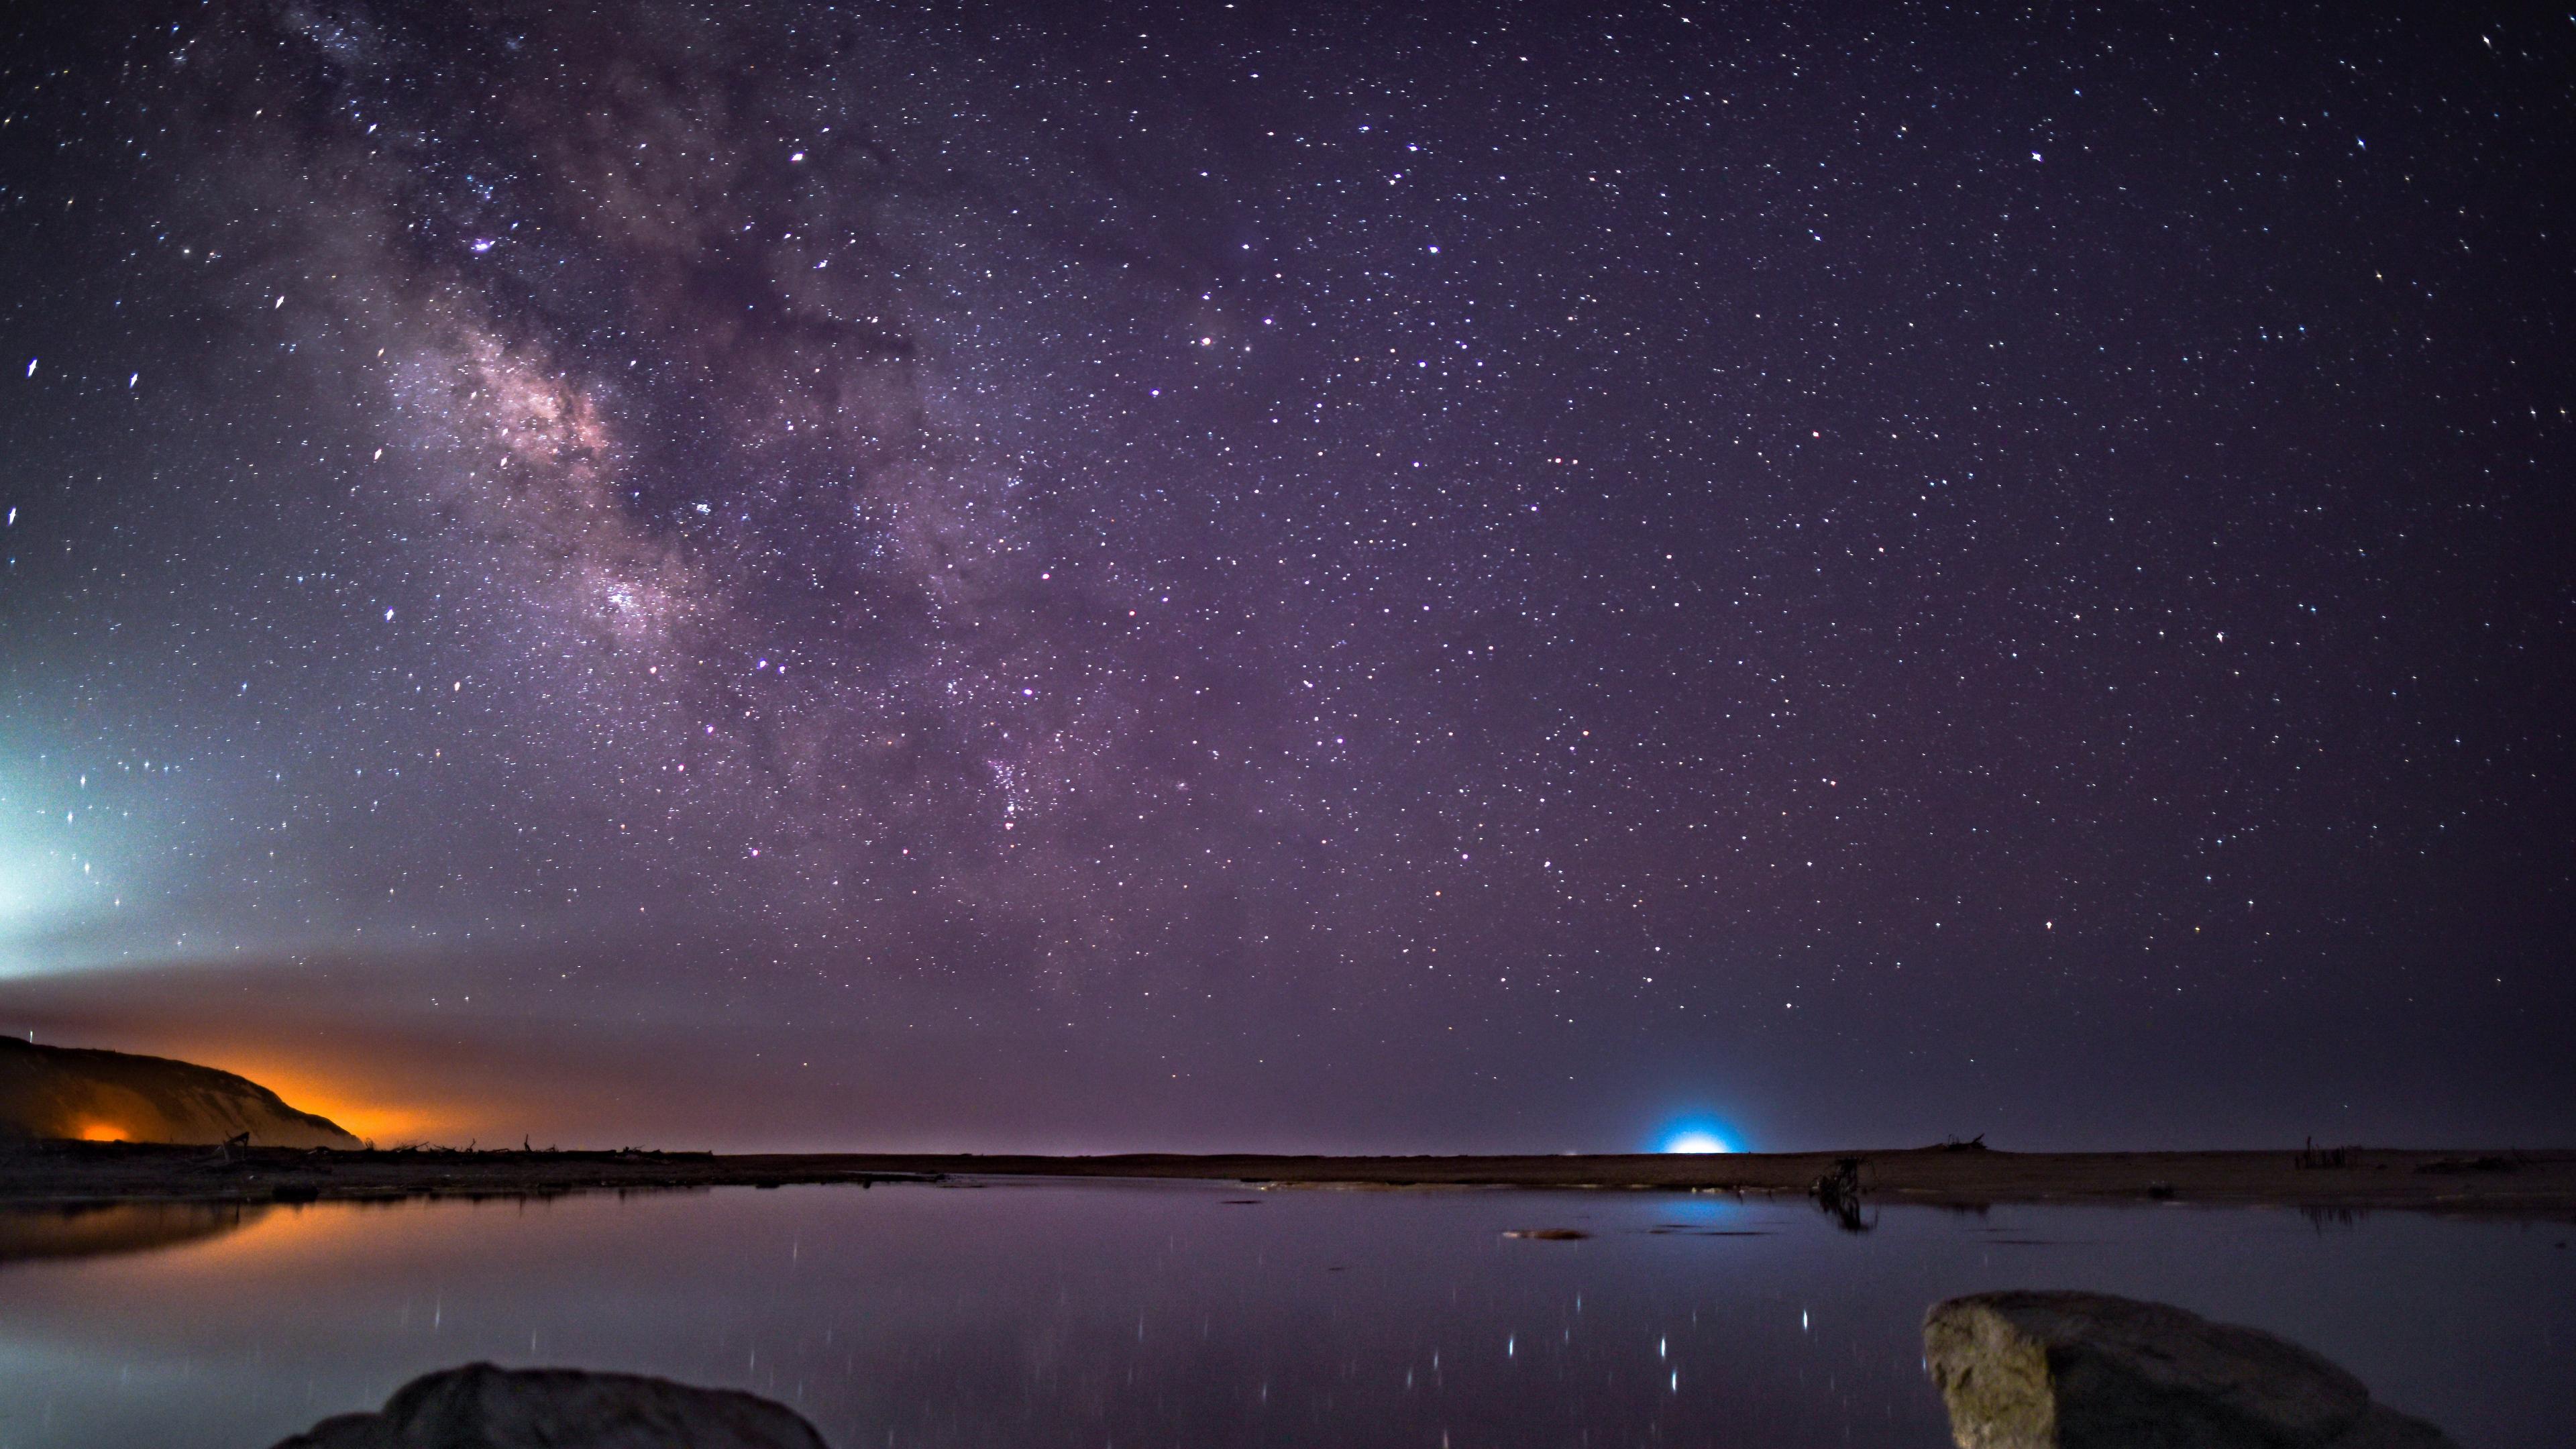 stars starry sky night purple 4k 1536017124 - stars, starry sky, night, purple 4k - Stars, starry sky, Night